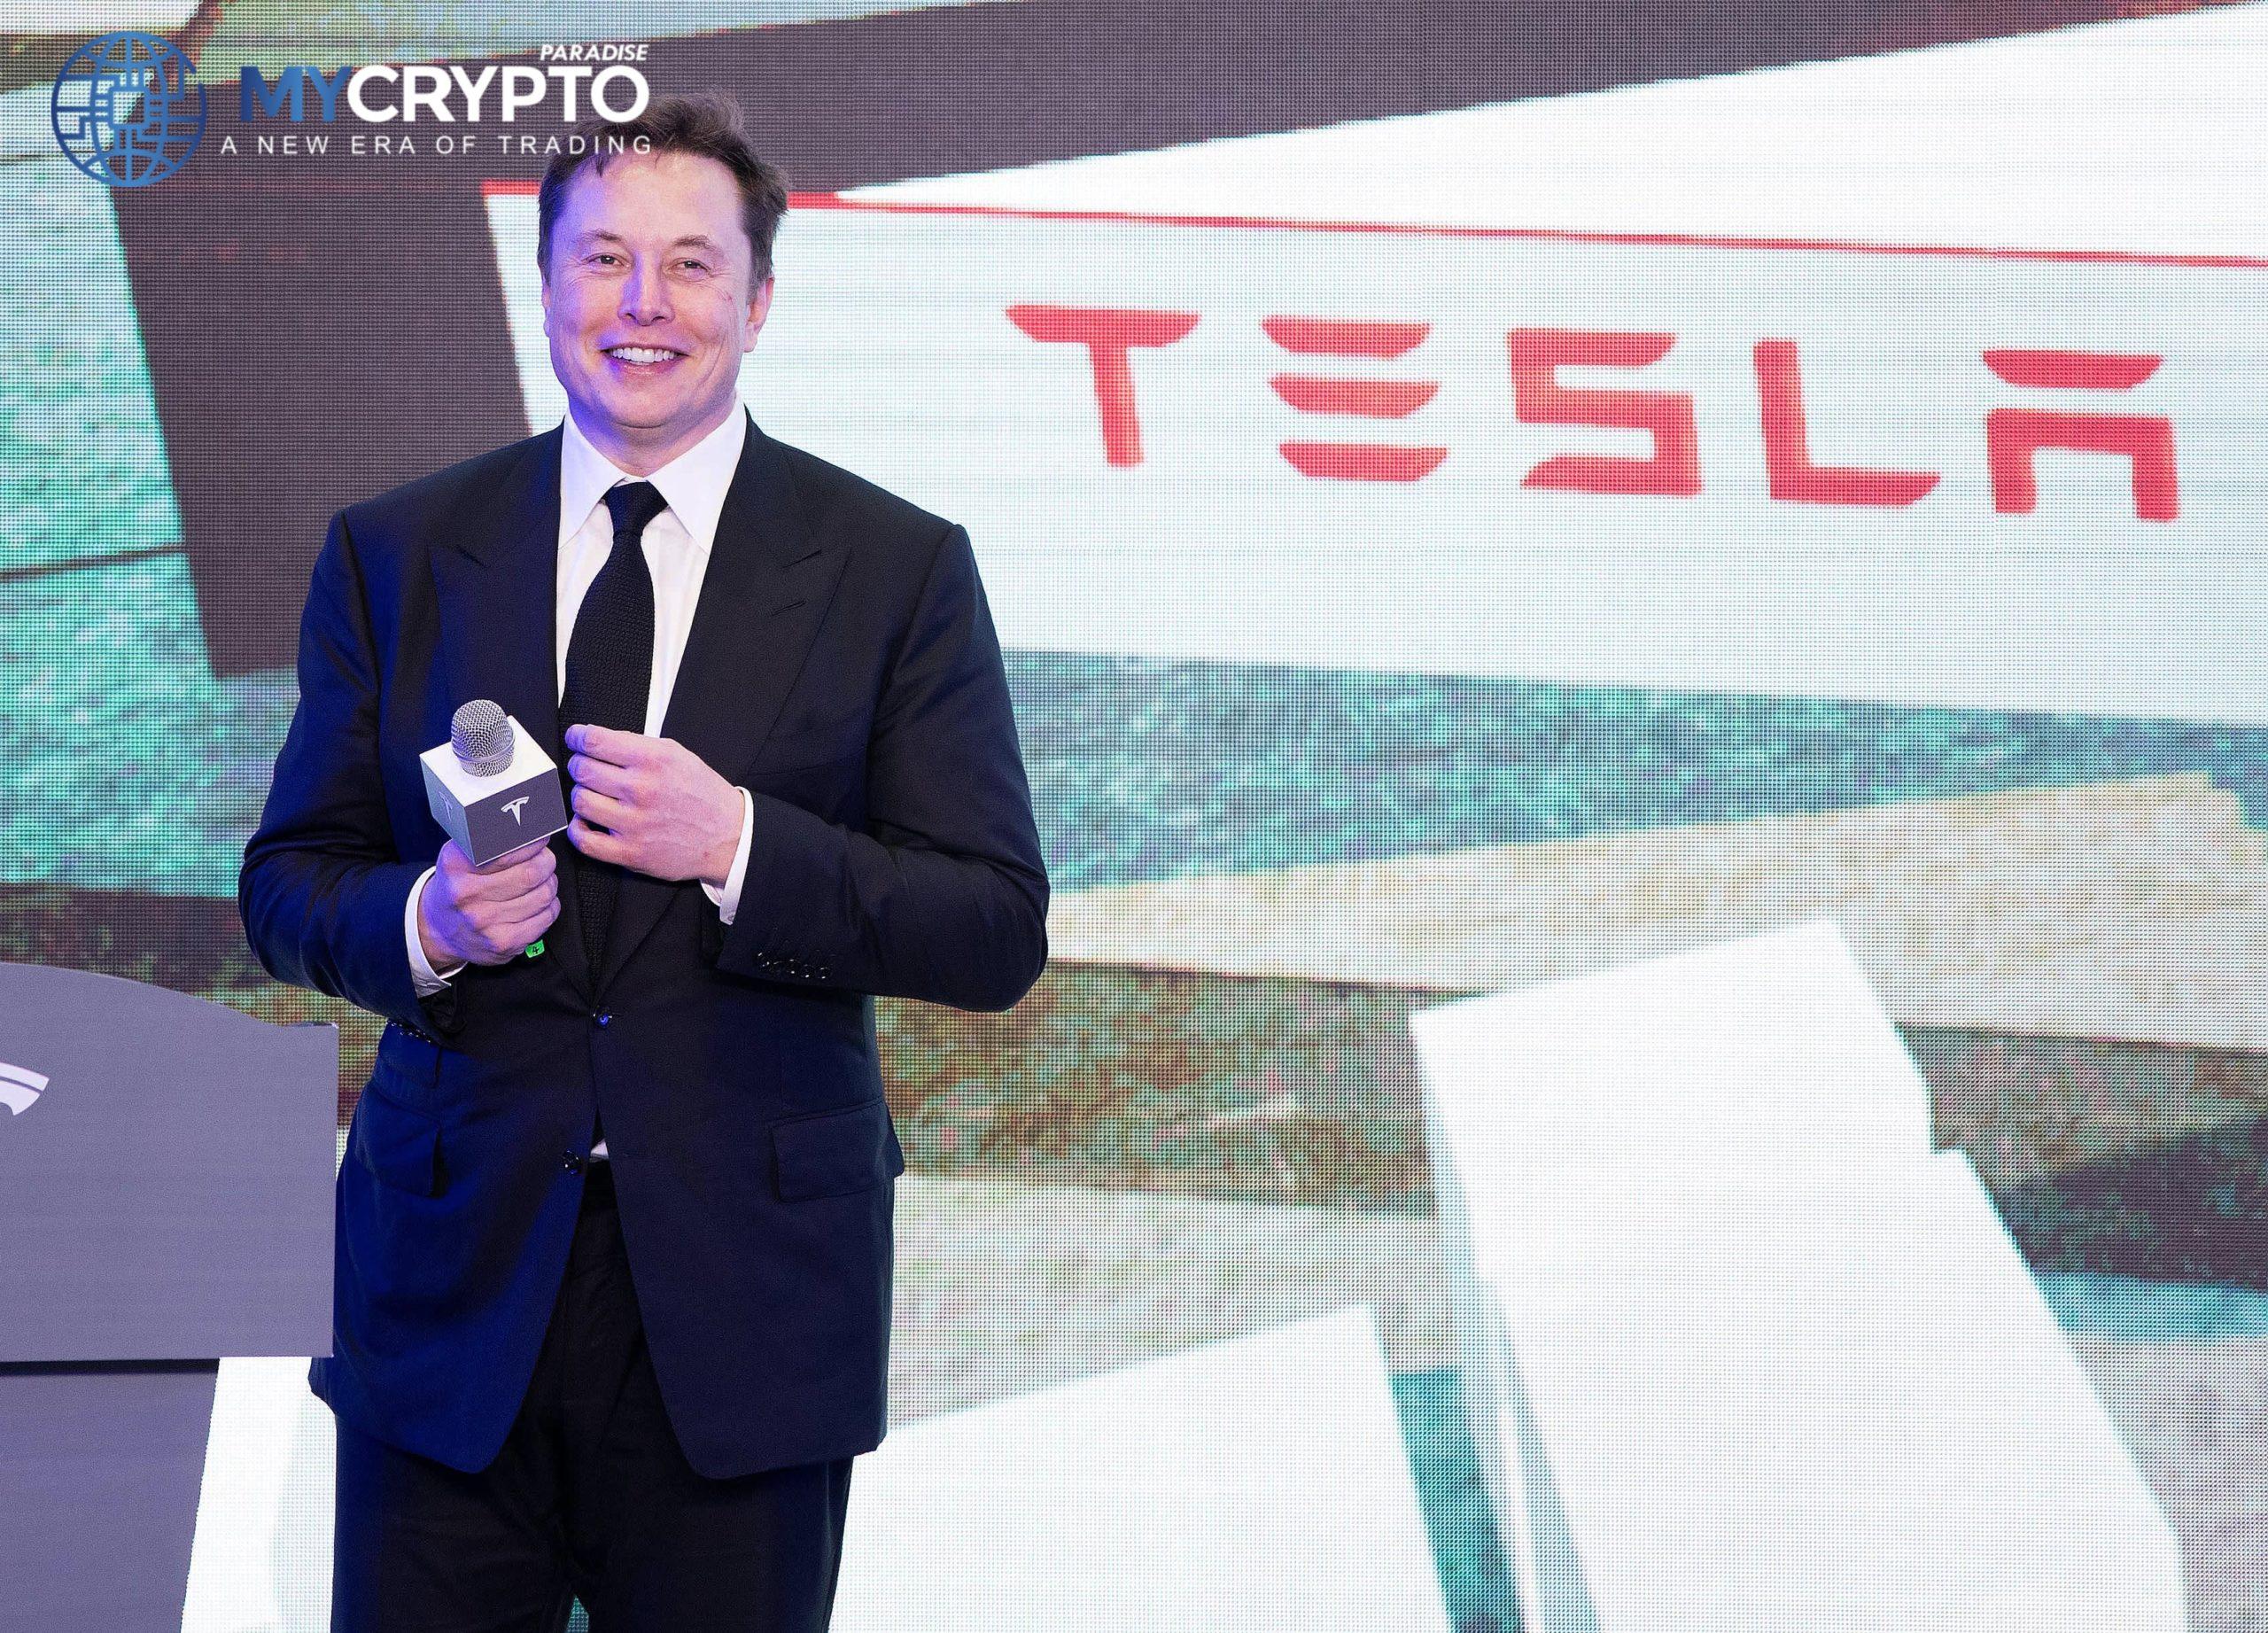 CEO Elon Musk